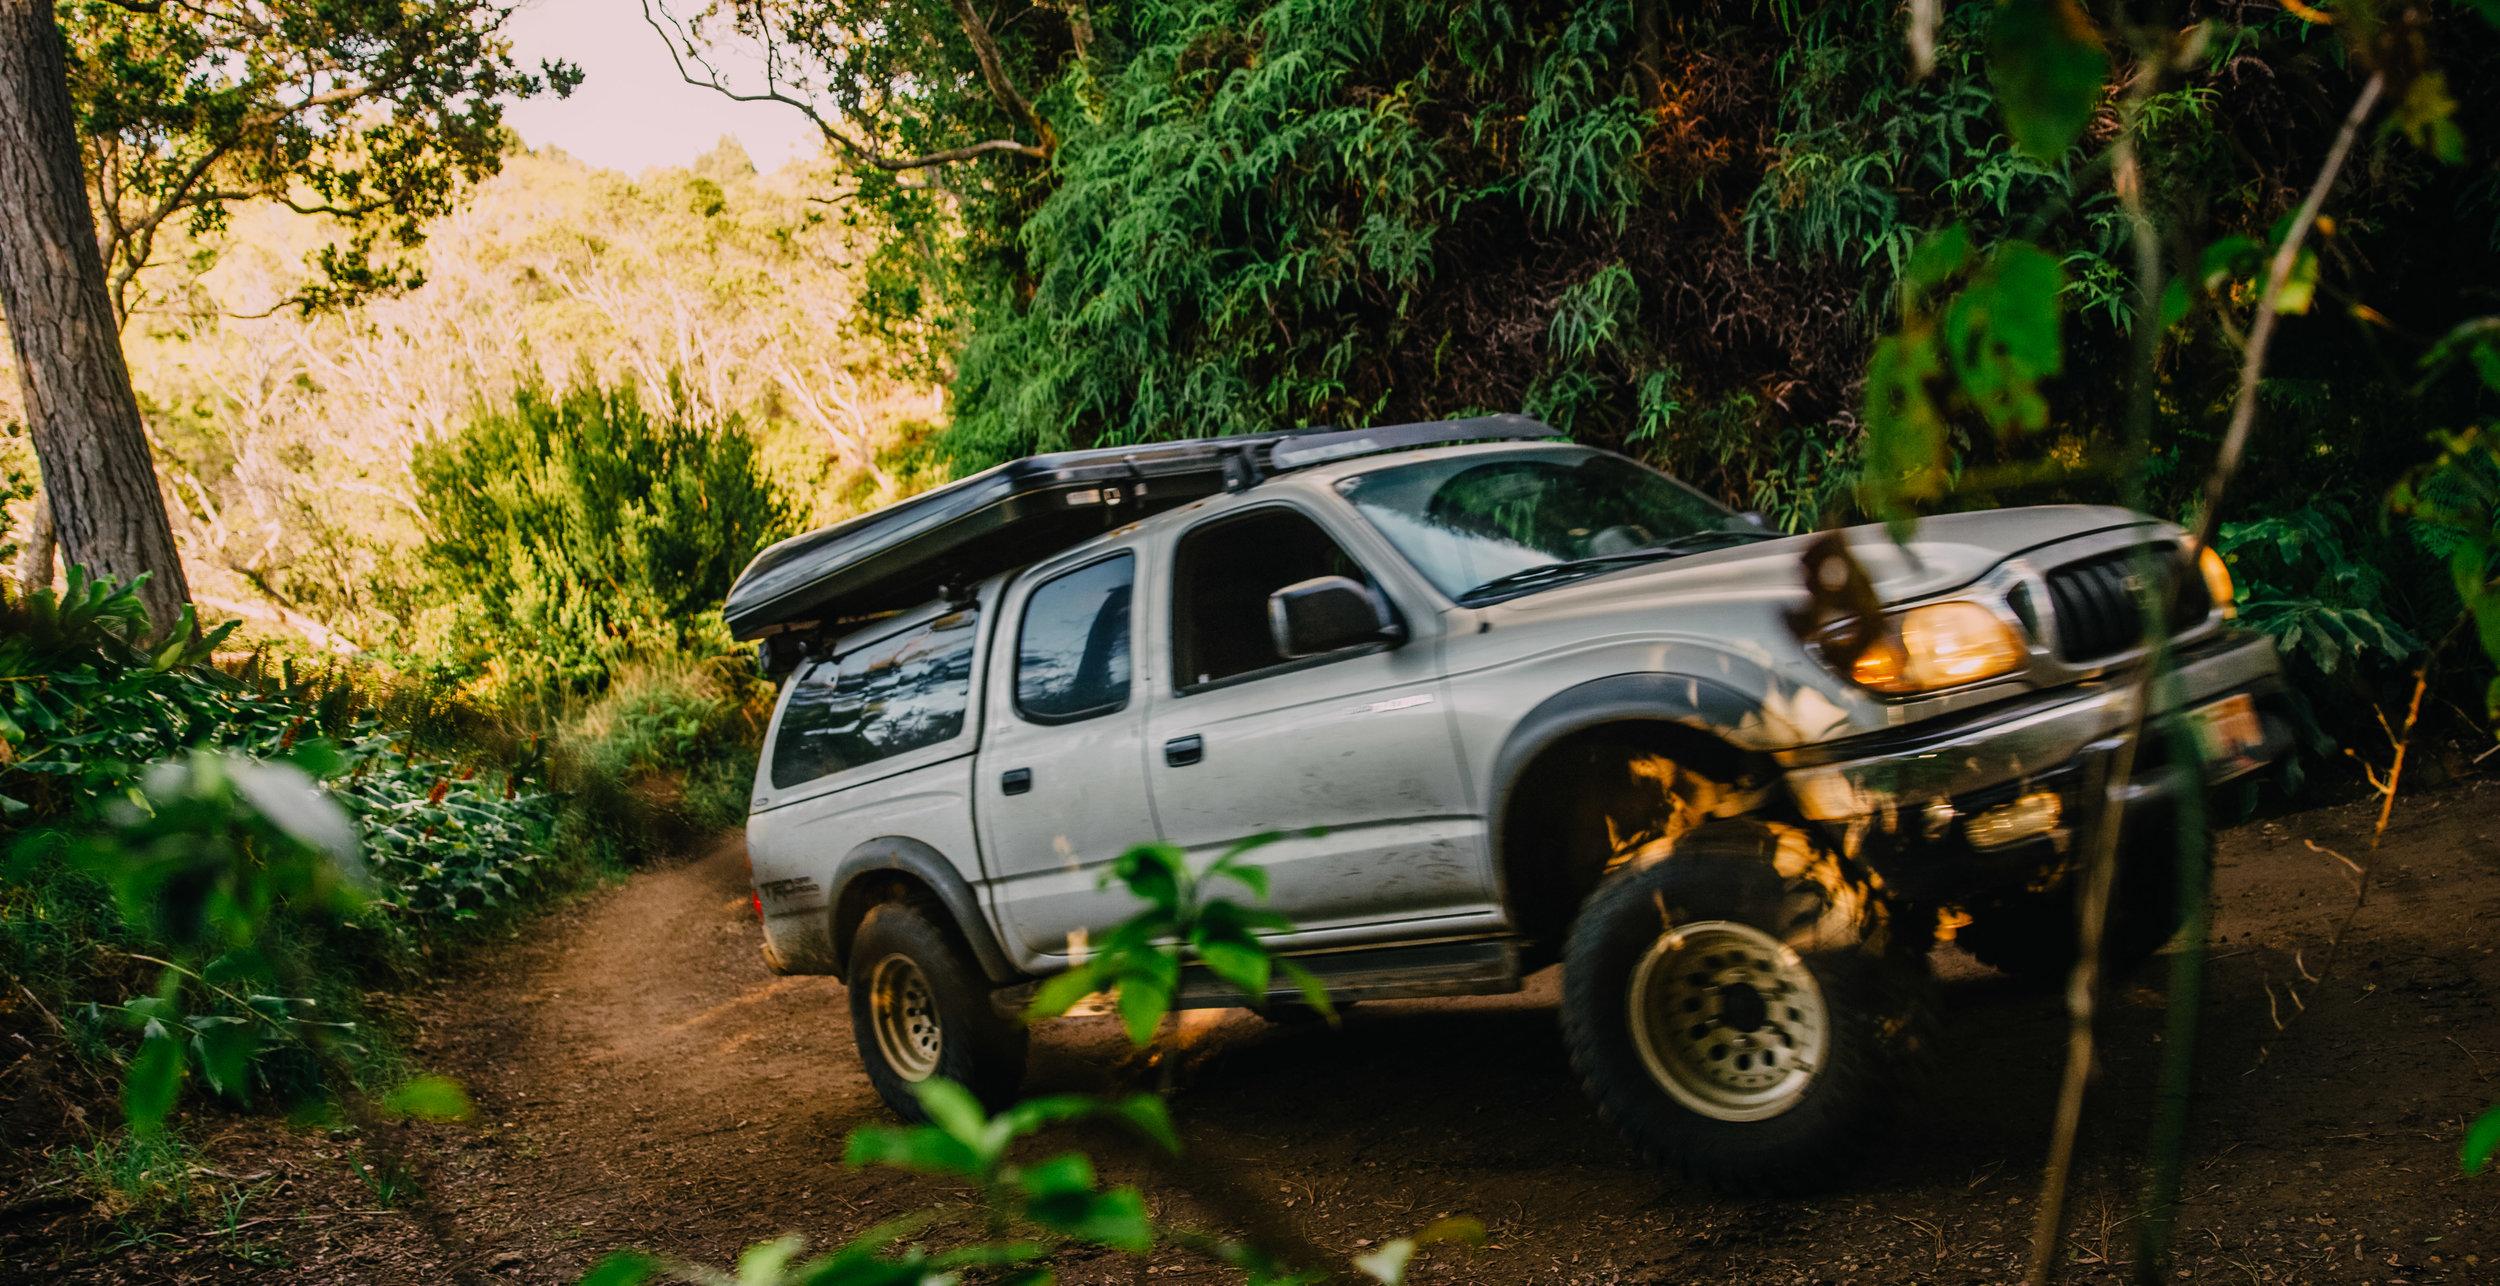 kauai-camping-occean-beach-polihale-kauai roof top campers-5.jpg